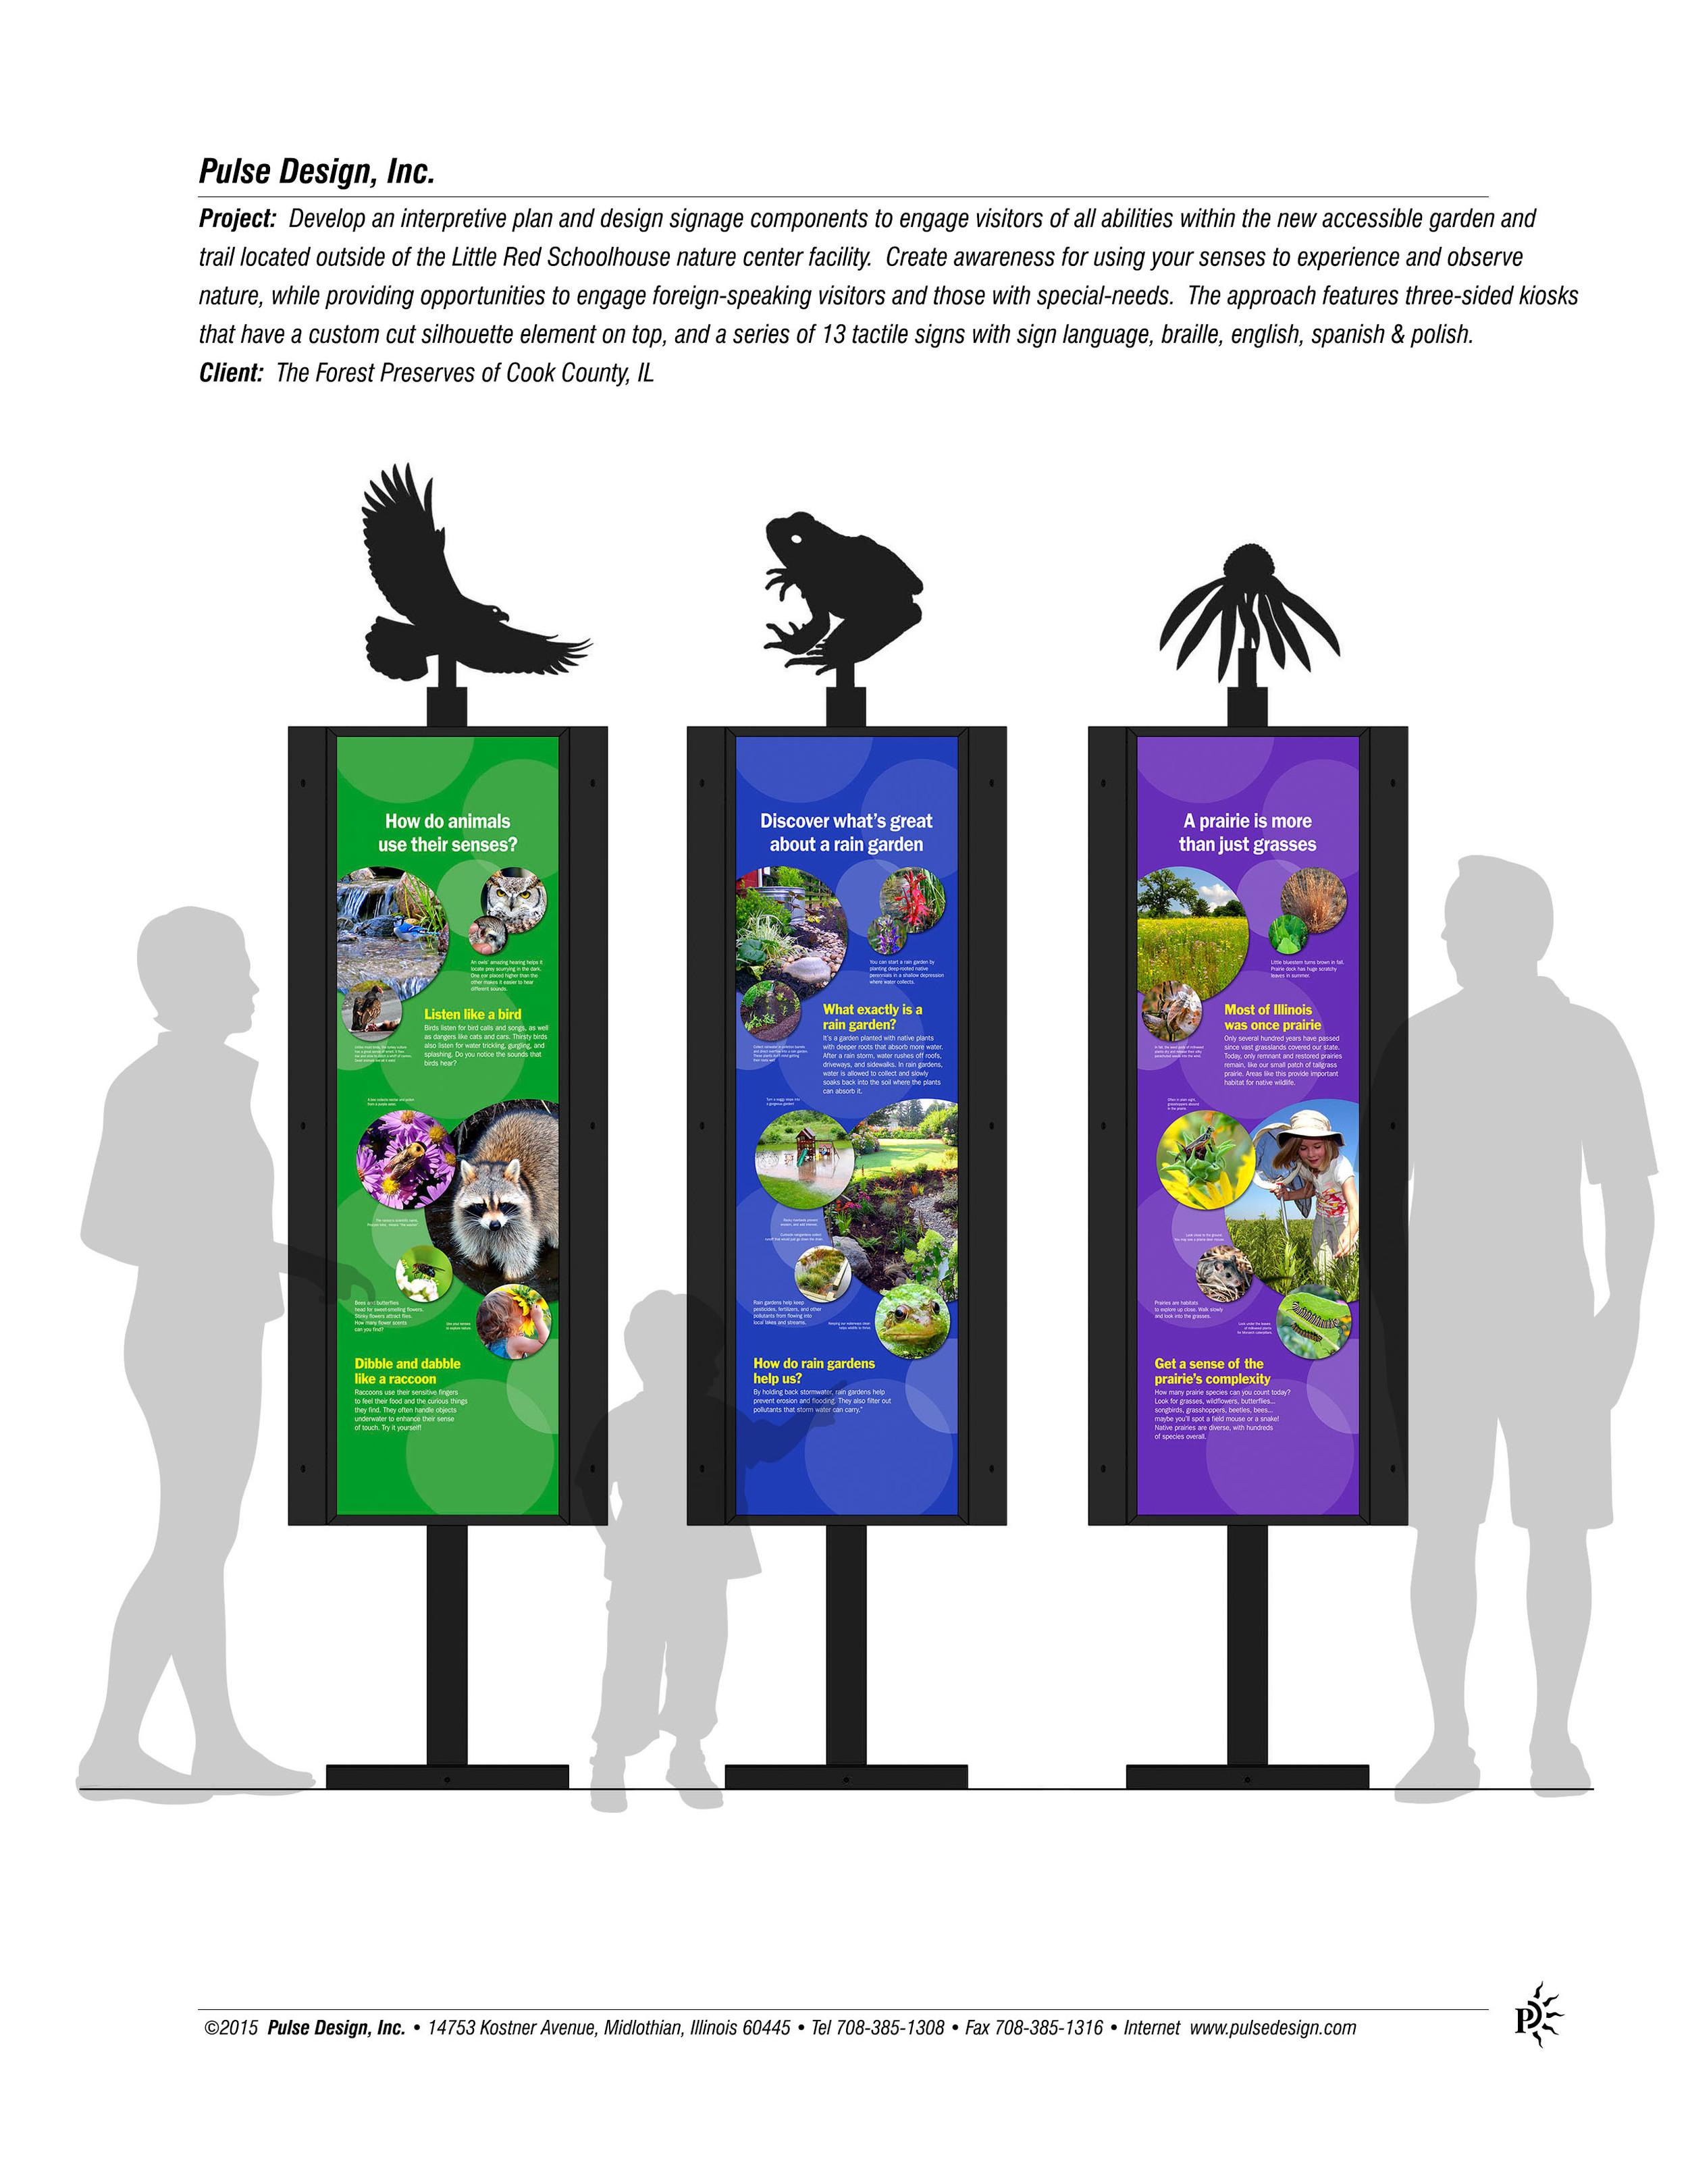 LittleRedSchoolhouse-Trail-Kiosks-w-People-Pulse-Design-Inc.jpg